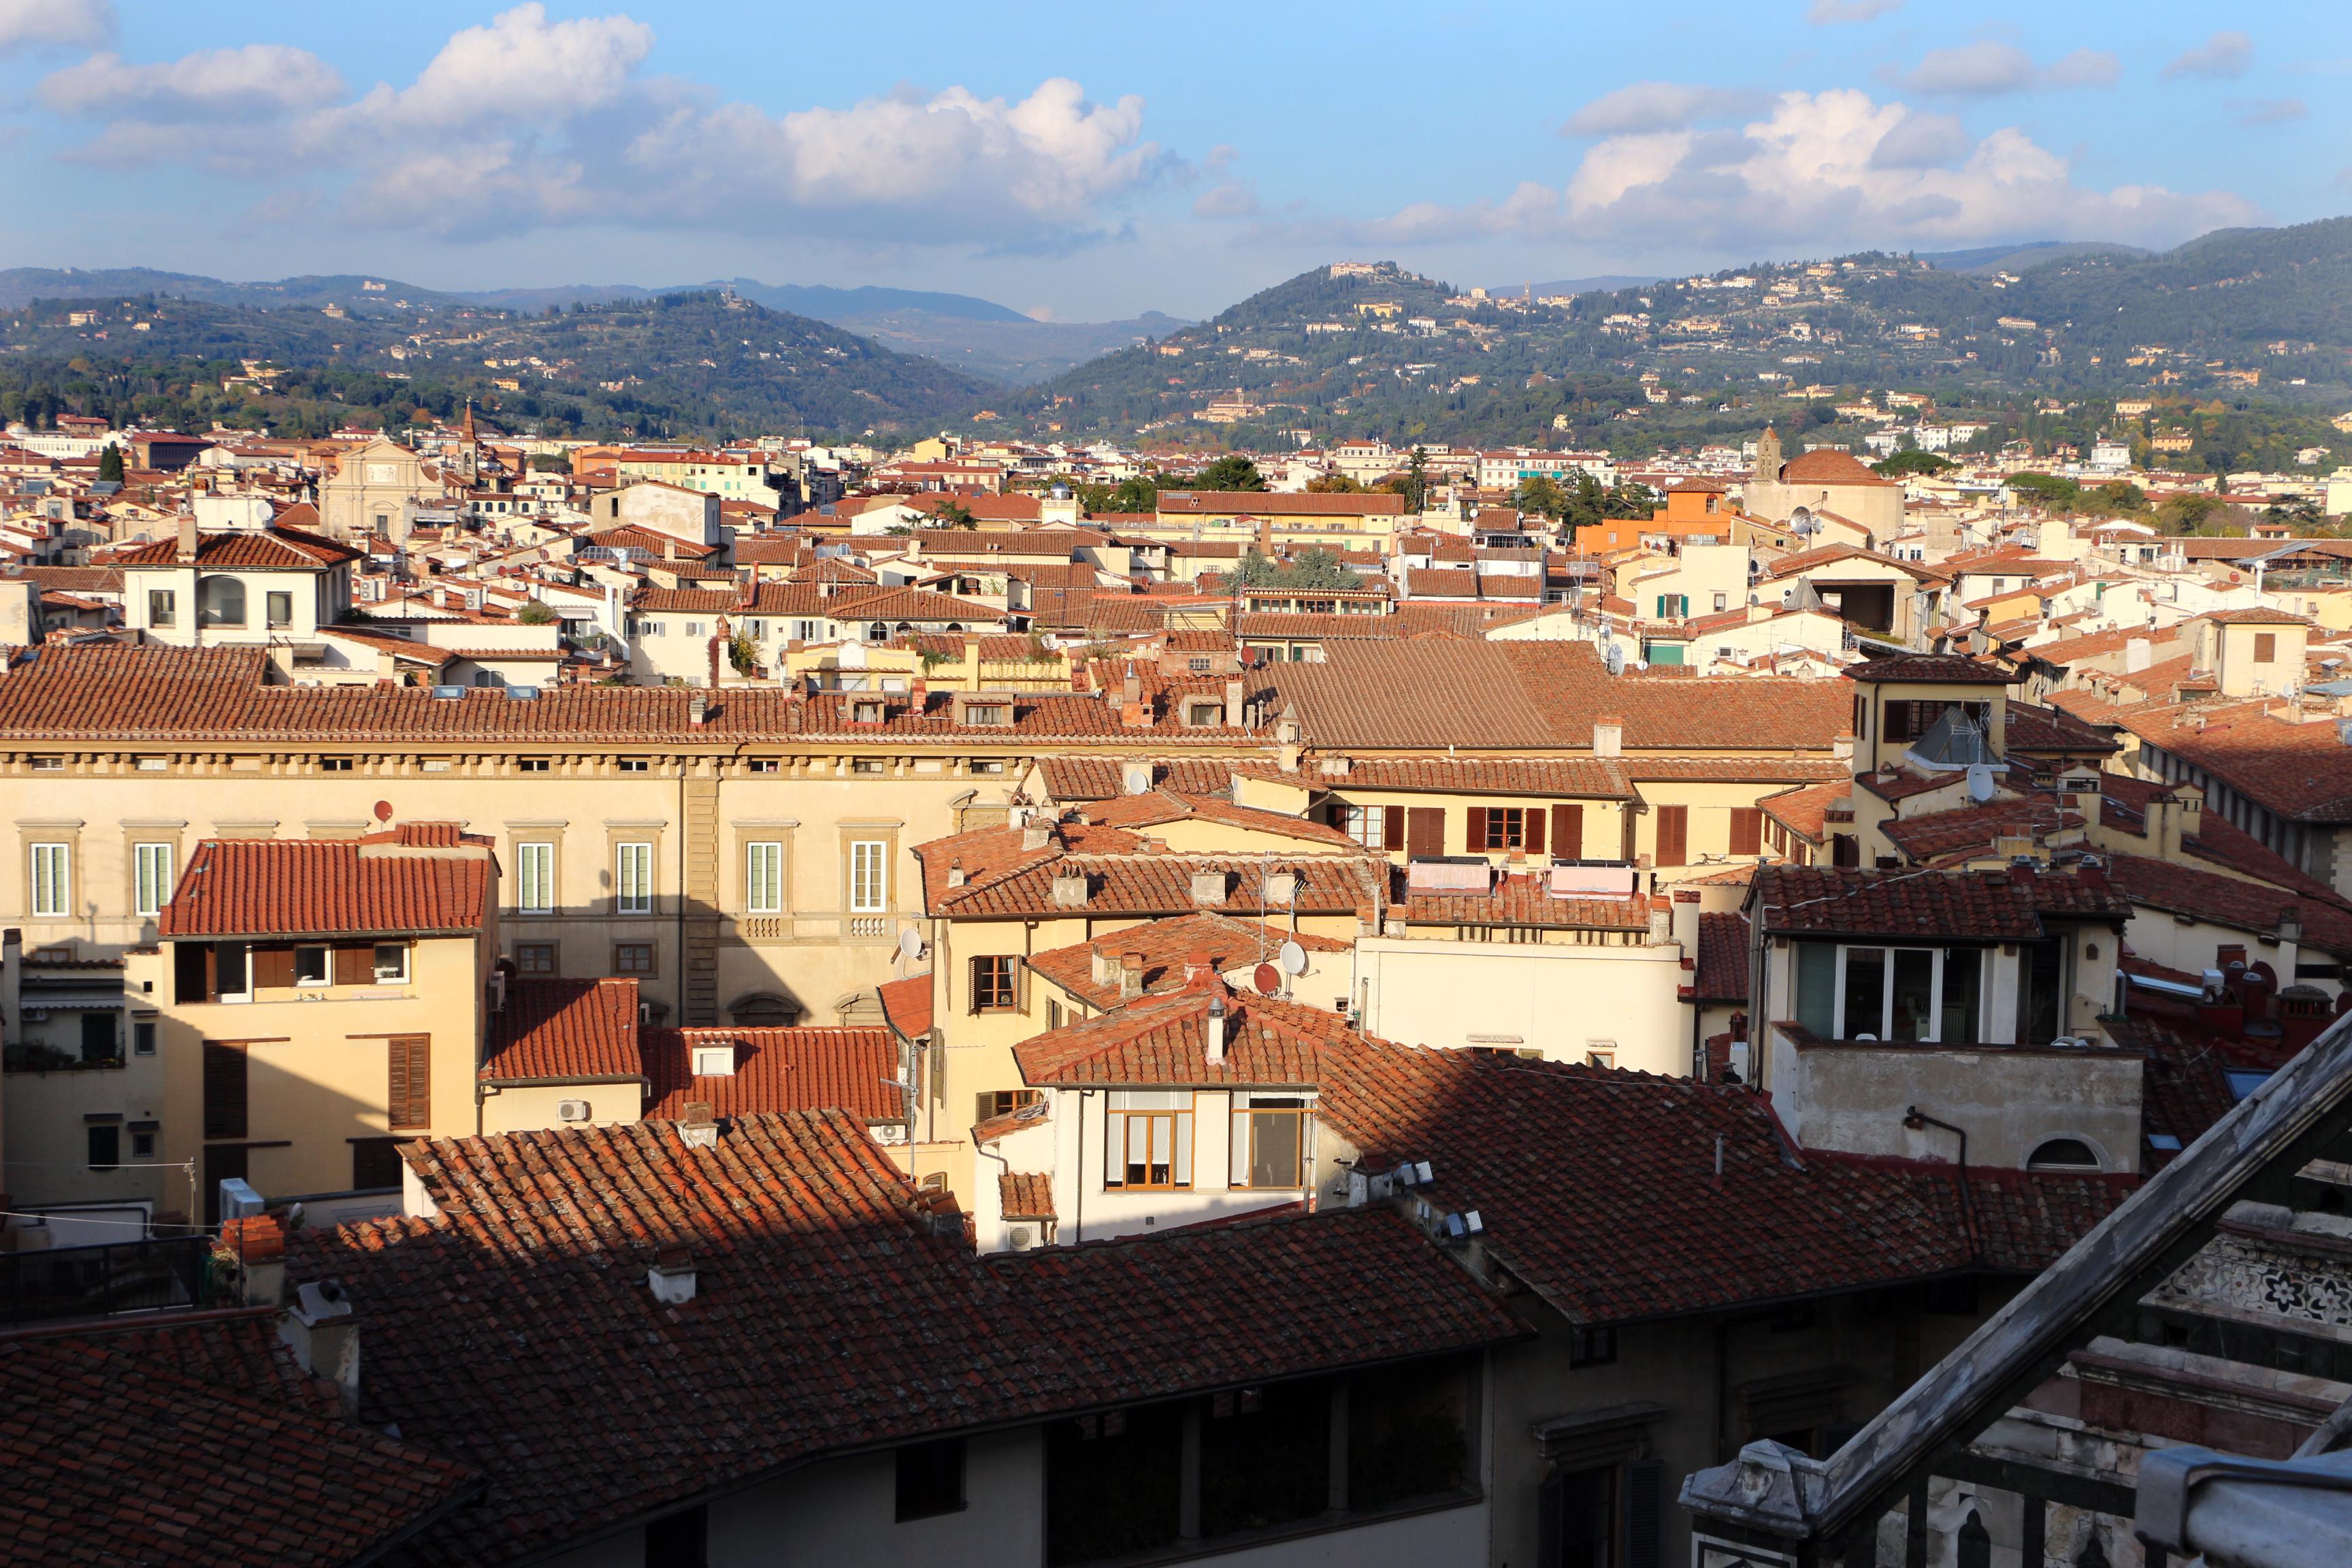 File:Terrazze del duomo, vedute su firenze, 01.JPG - Wikimedia Commons